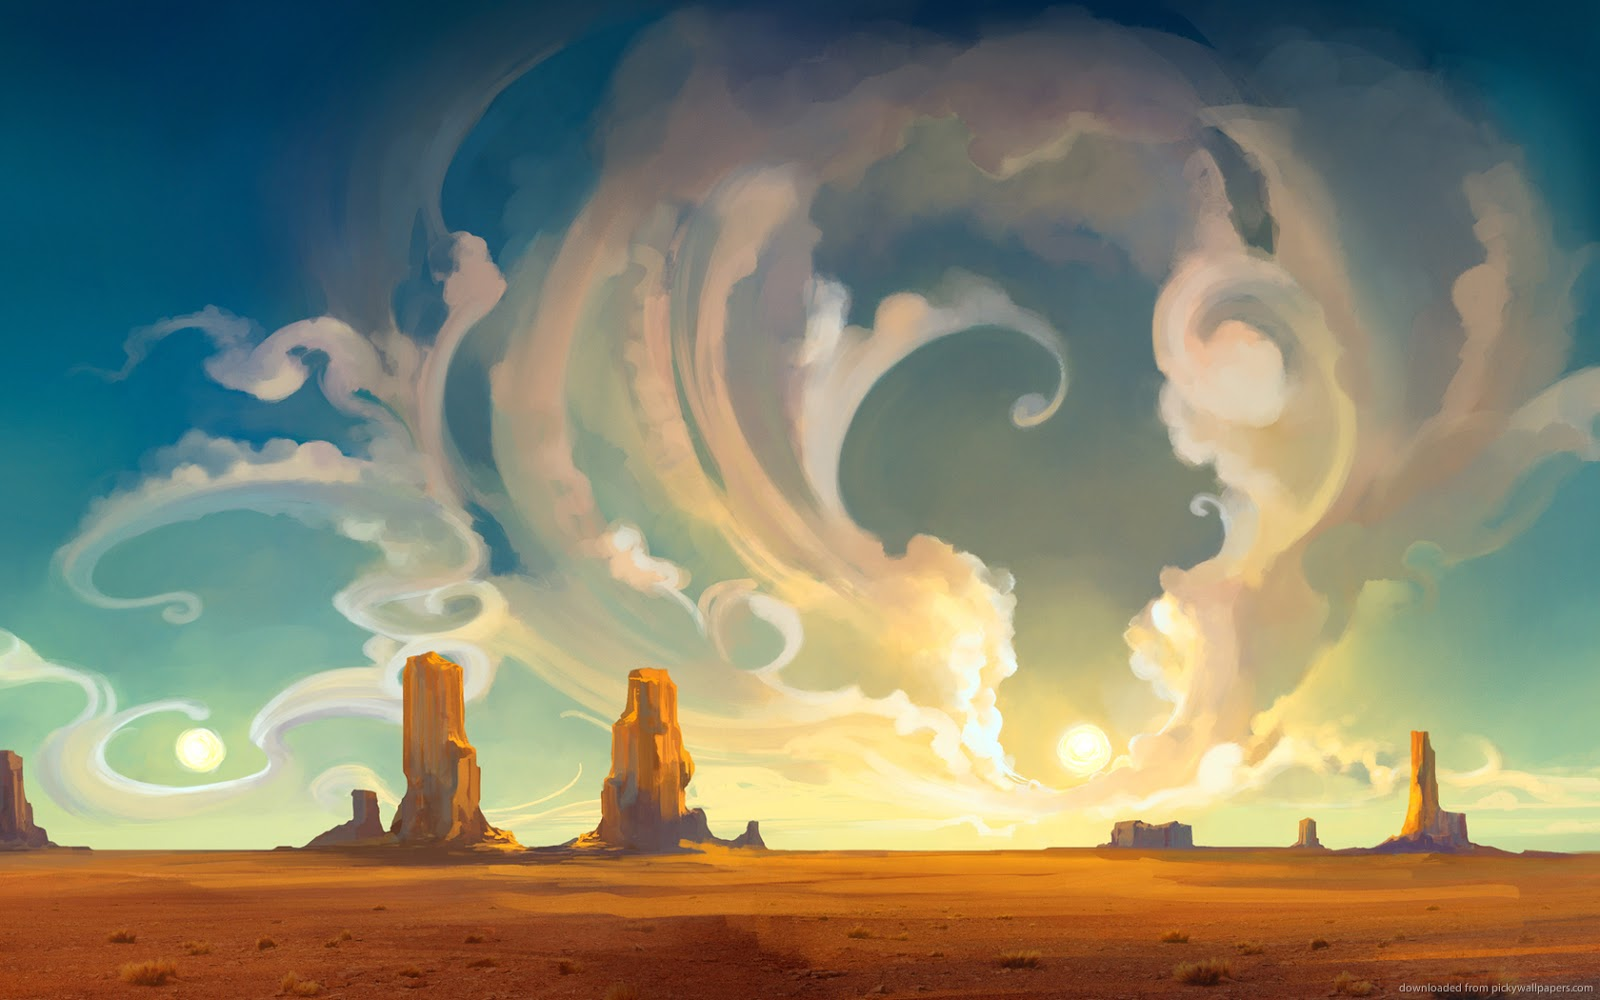 http://1.bp.blogspot.com/-KdwEYDt8tHo/T3sl--wwb6I/AAAAAAAAGJU/X0TXS5xqcl0/s1600/american-desert-art.jpg